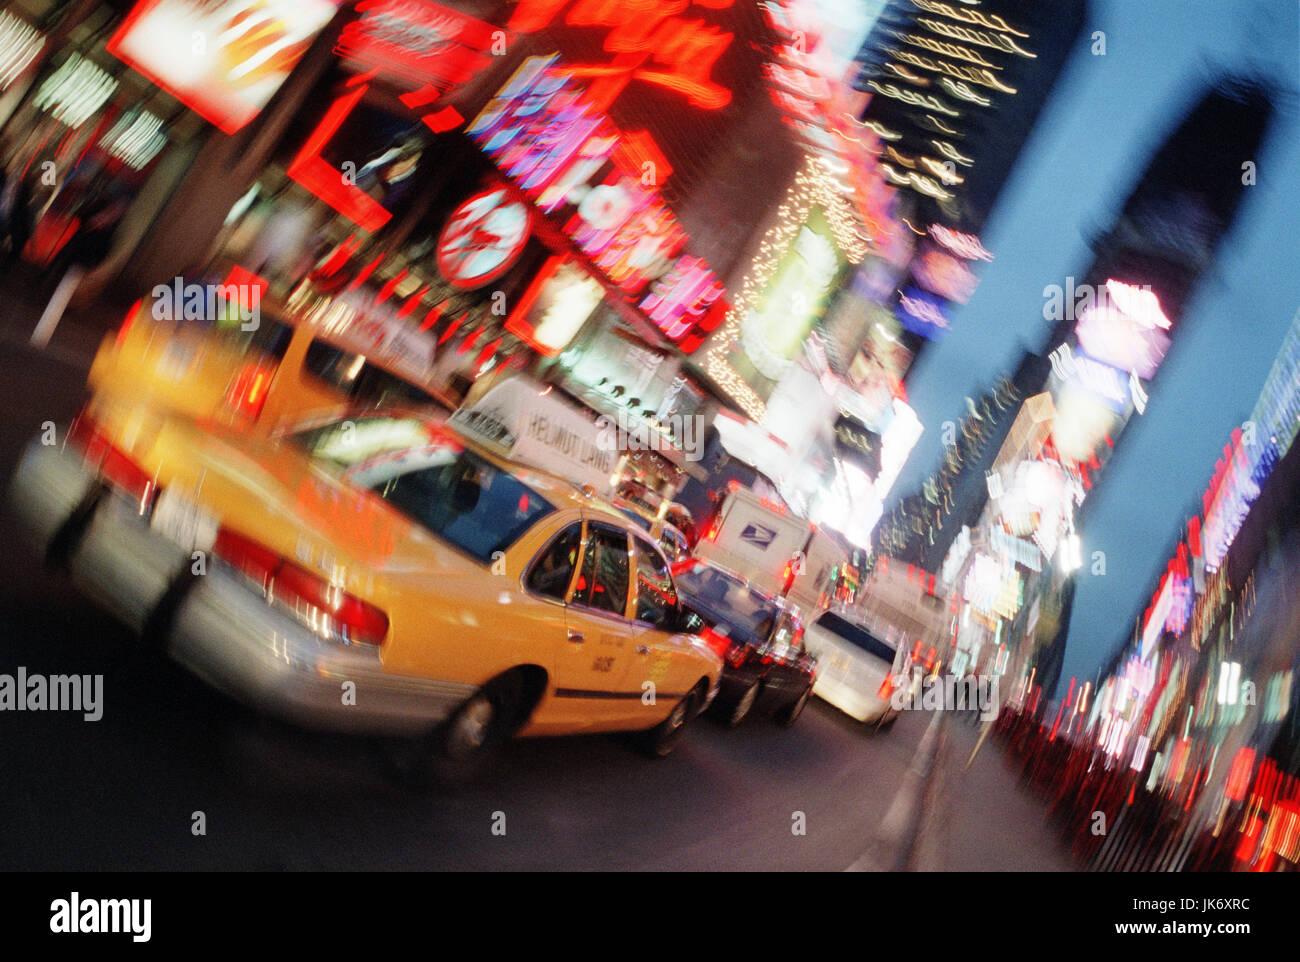 USA, New York City, Times Square,  Straßenszene, Unschärfe  Amerika, Großstadt, Weltstadt, Verkehr, - Stock Image